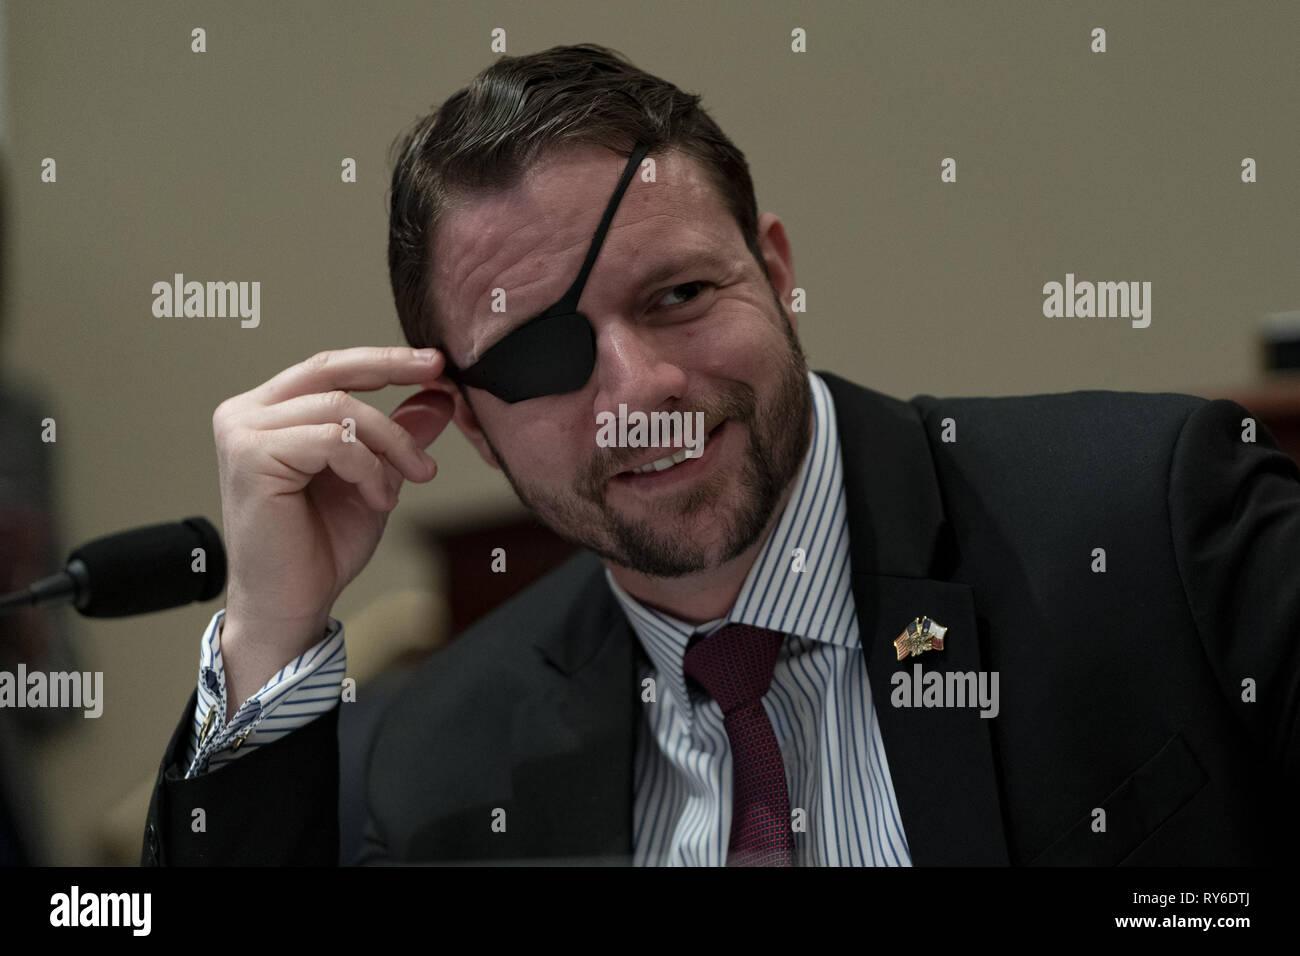 Washington, District of Columbia, USA. 12th Mar, 2019. Representative DAN CRENSHAW (R-TX) at a House Budget Committee hearing, March 12, 2019 Credit: Douglas Christian/ZUMA Wire/Alamy Live News - Stock Image